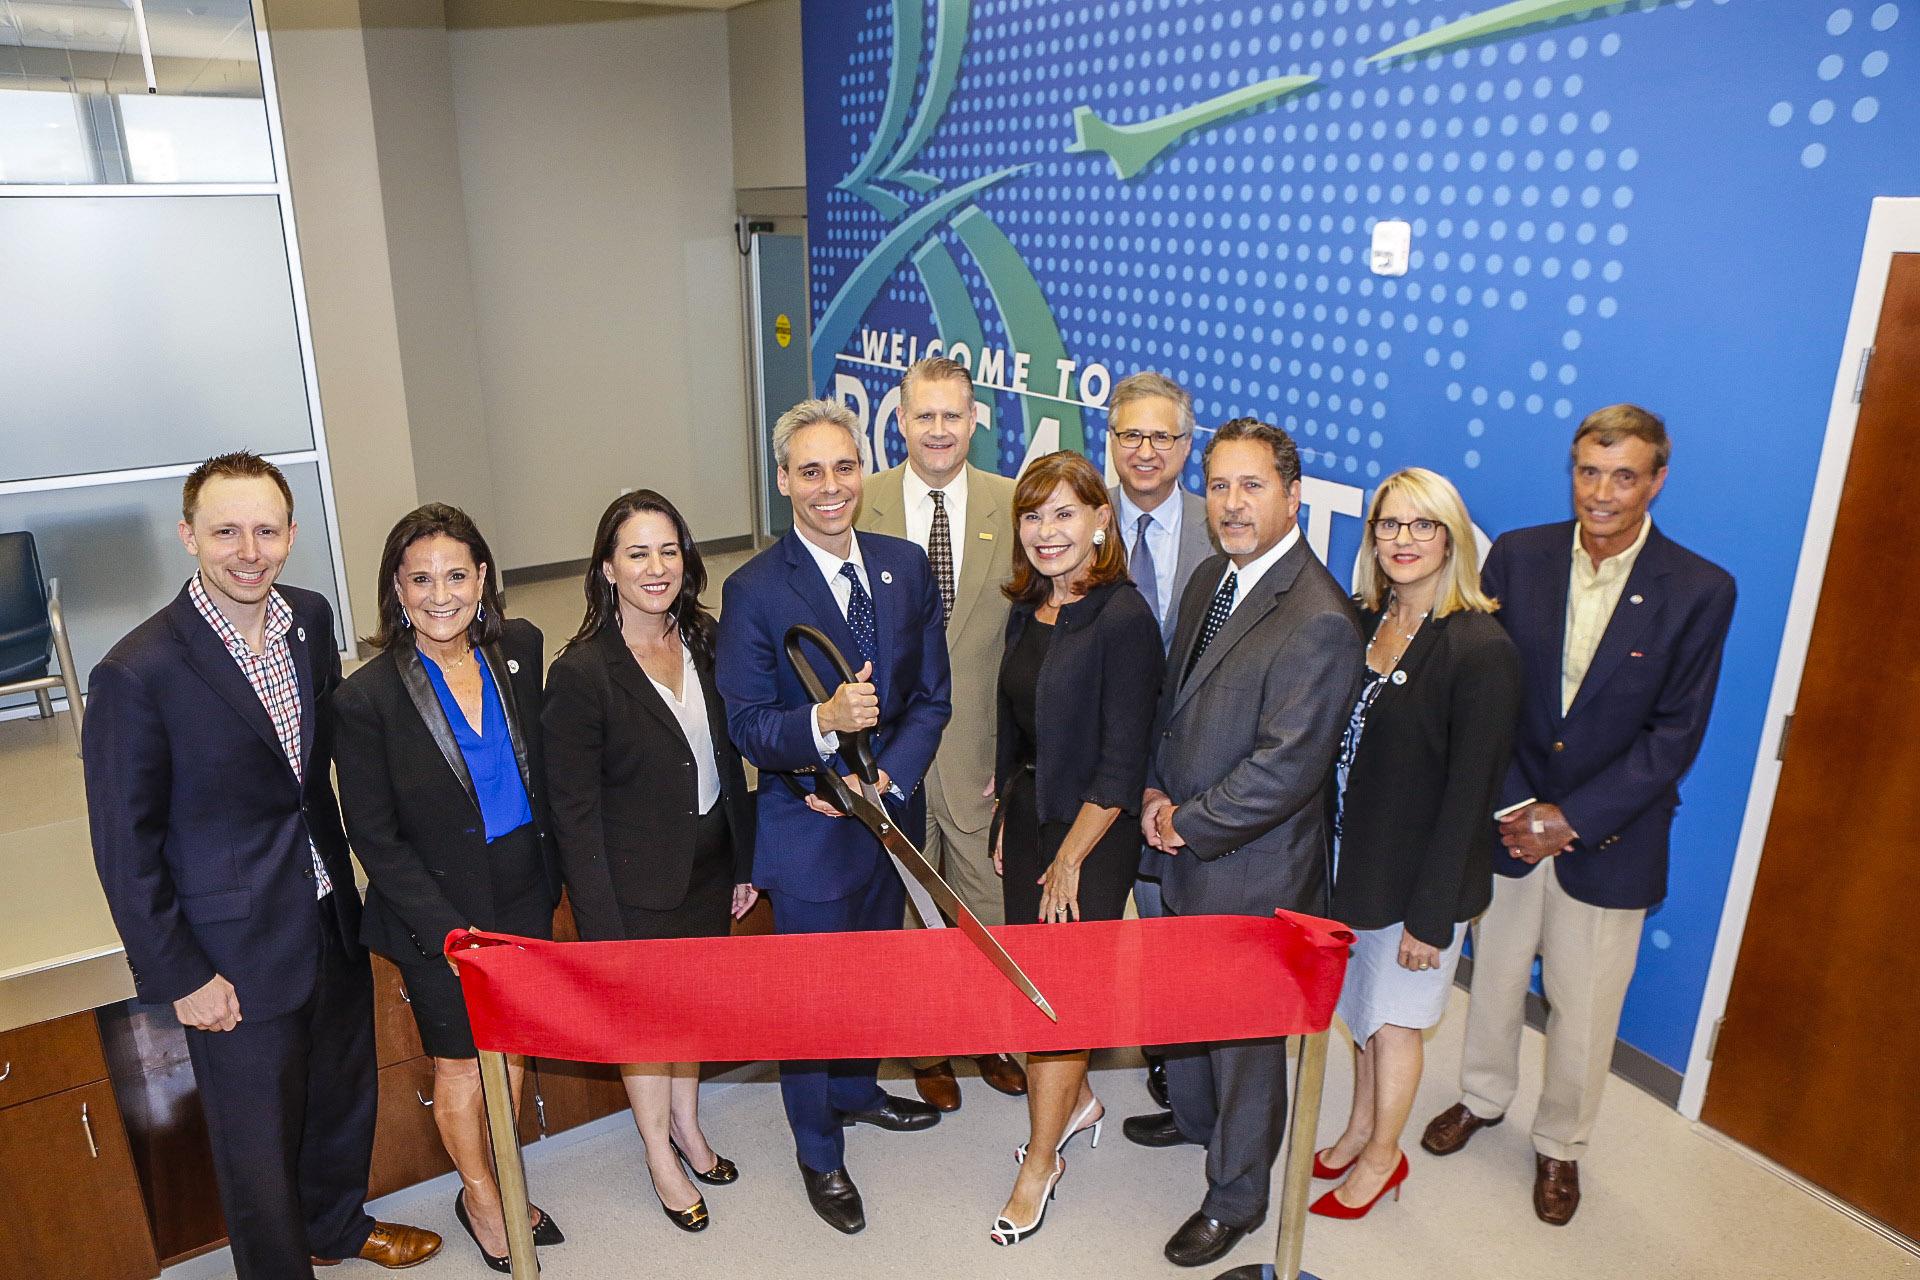 Mayor Scott Singer cuts ribbon at grand opening ceremonies at BRAA U.S Customs & Border Protection Service office